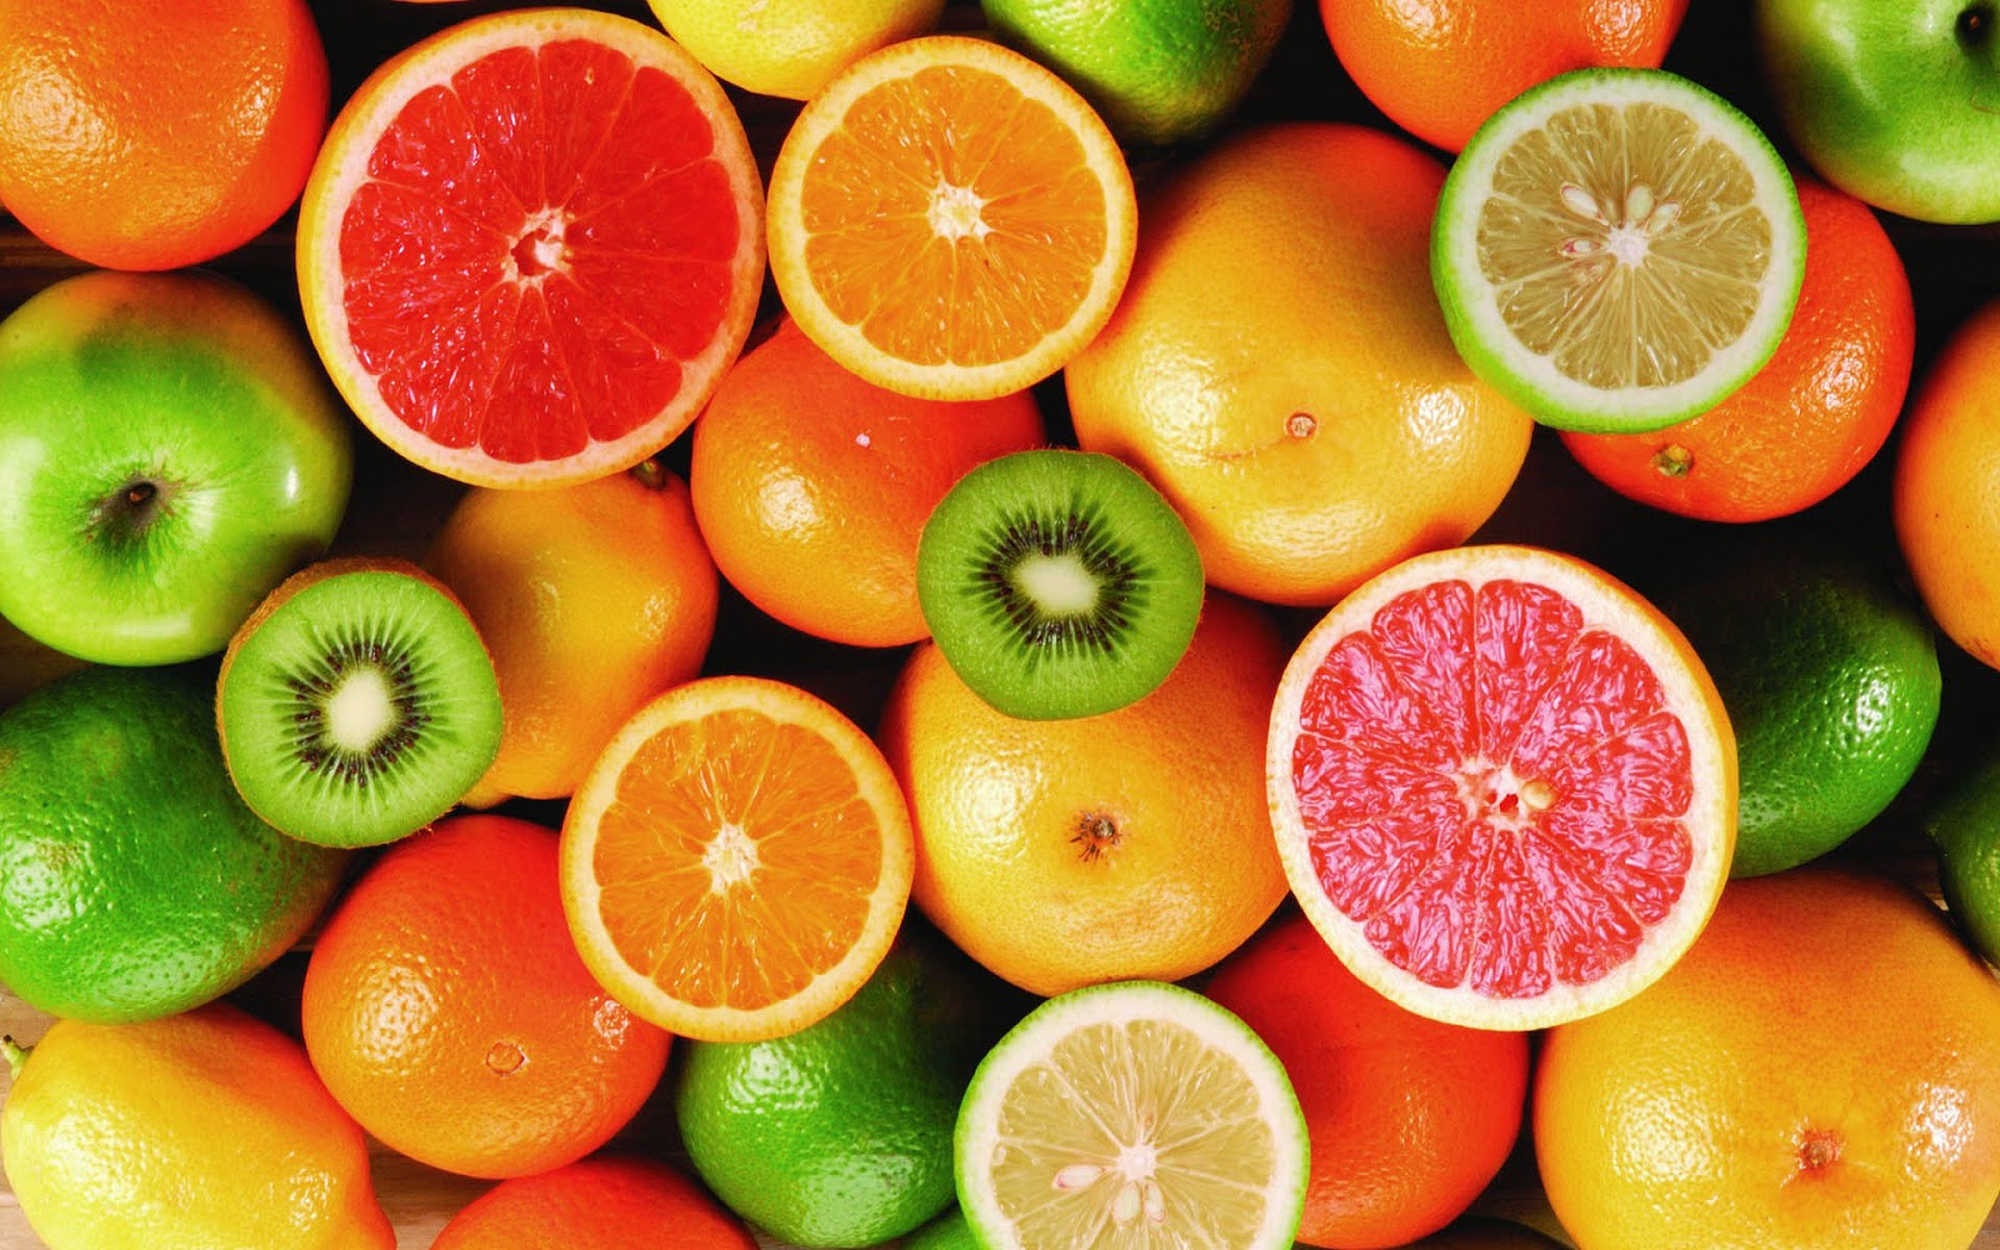 THE GROWN UP EDIT - Vitamin C